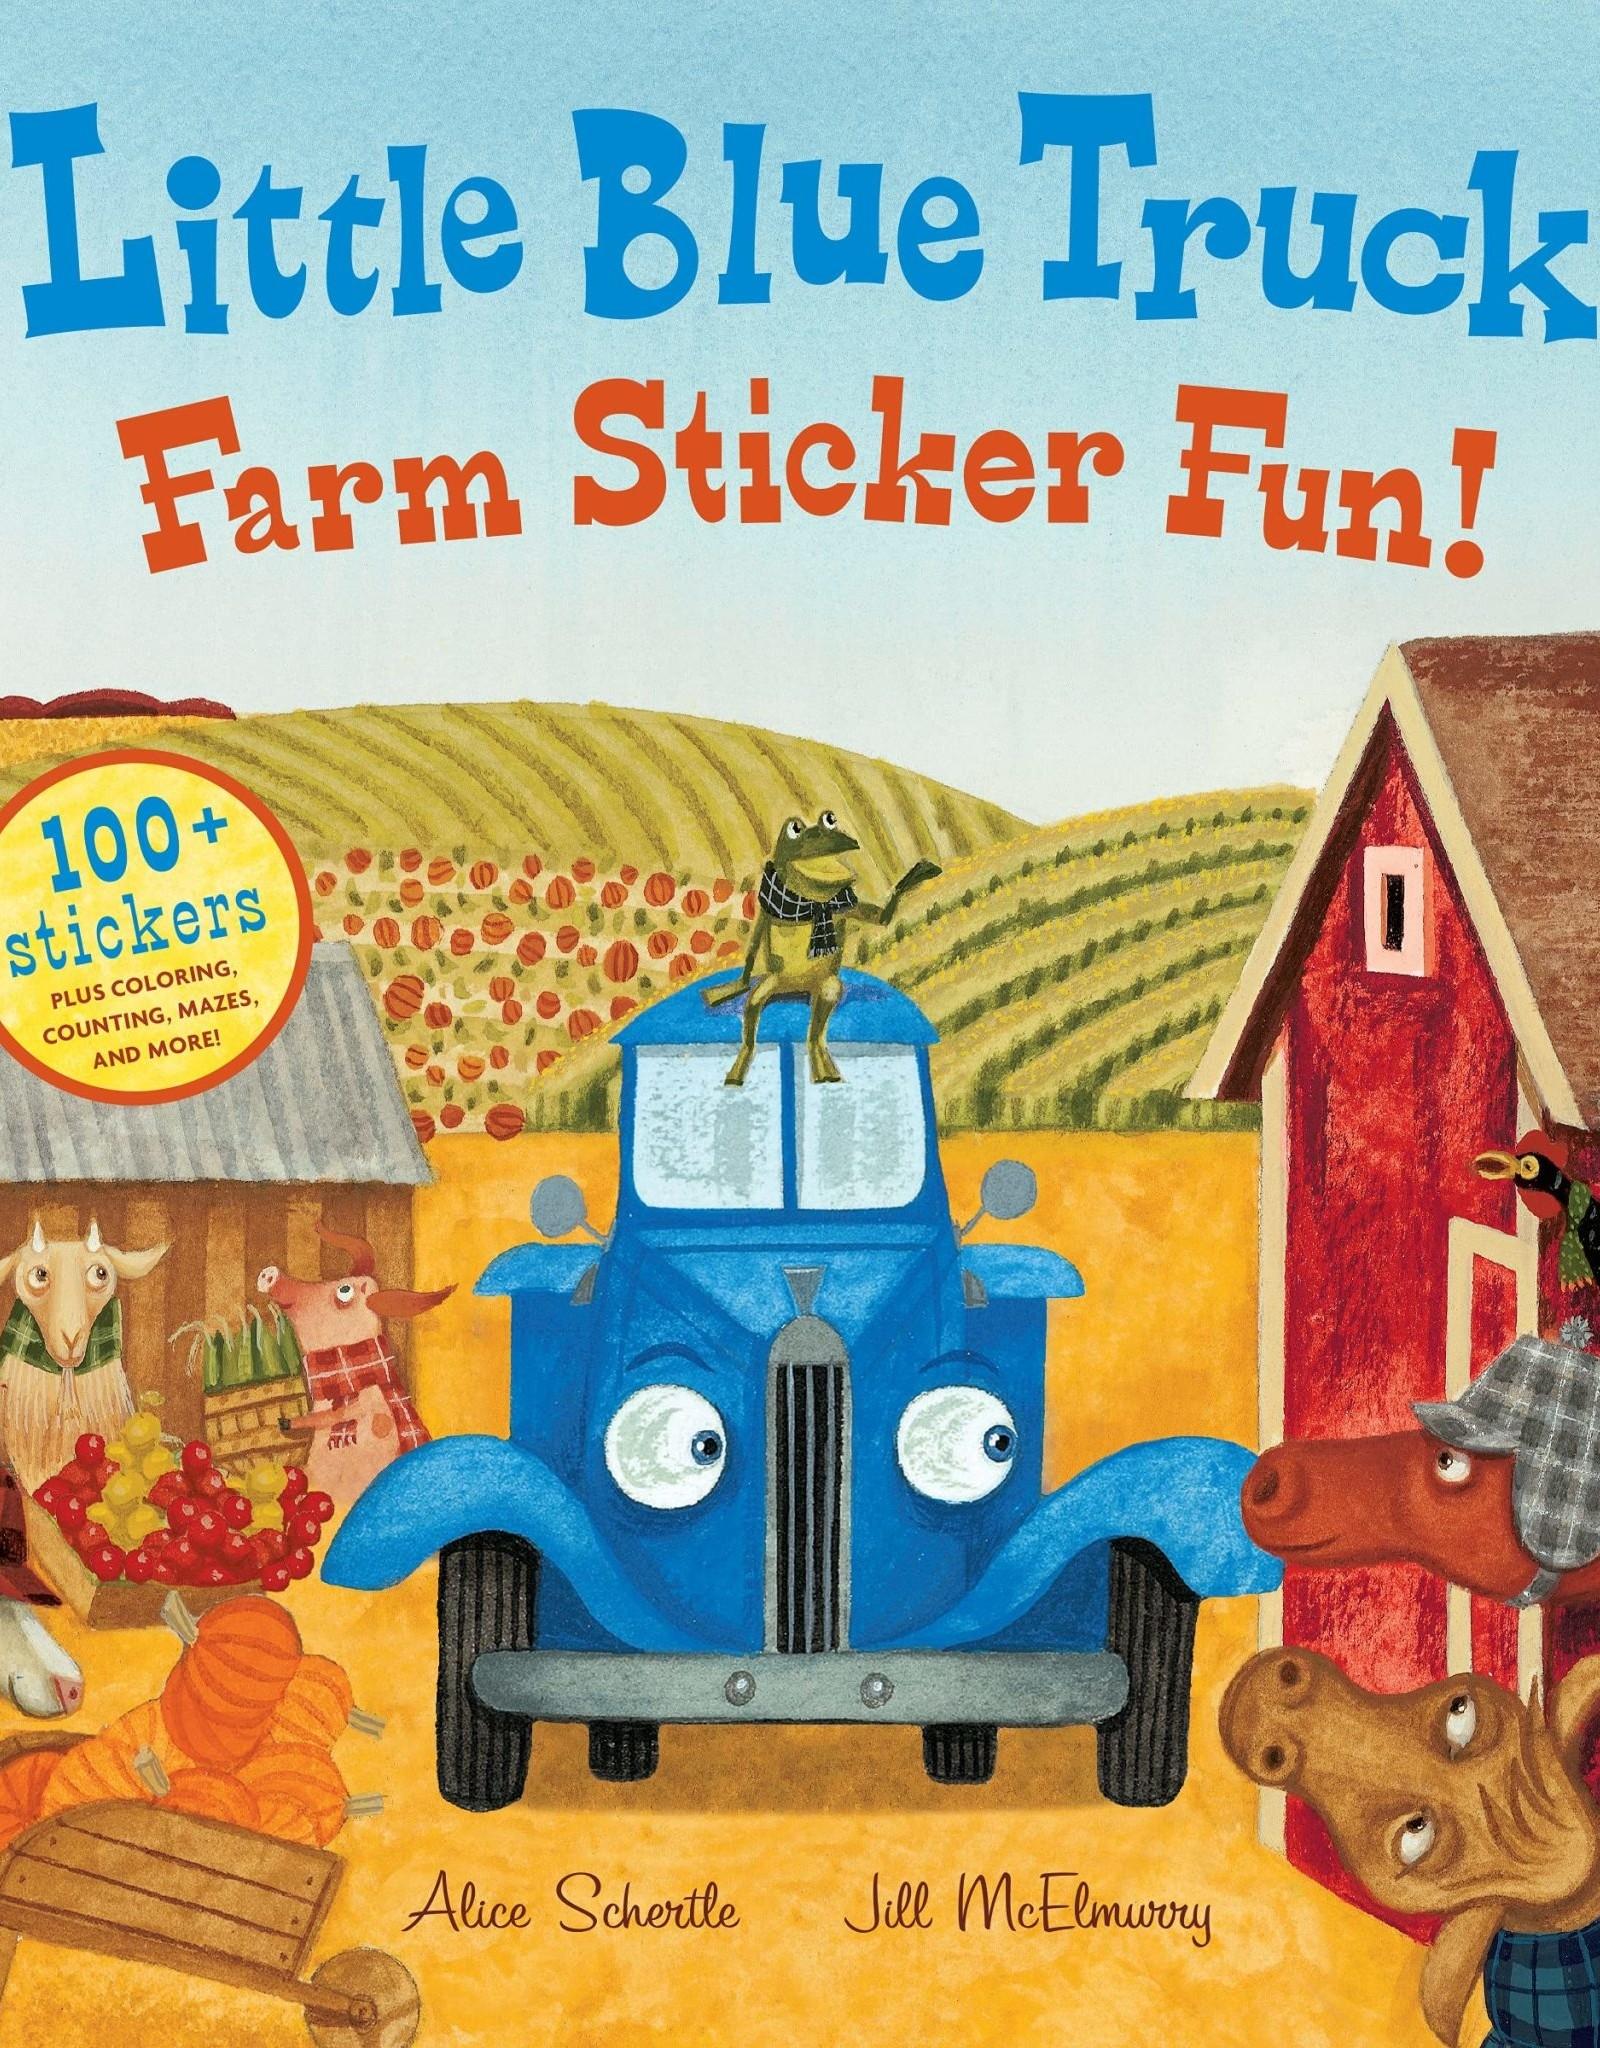 Little Blue Truck: Farm Sticker Fun